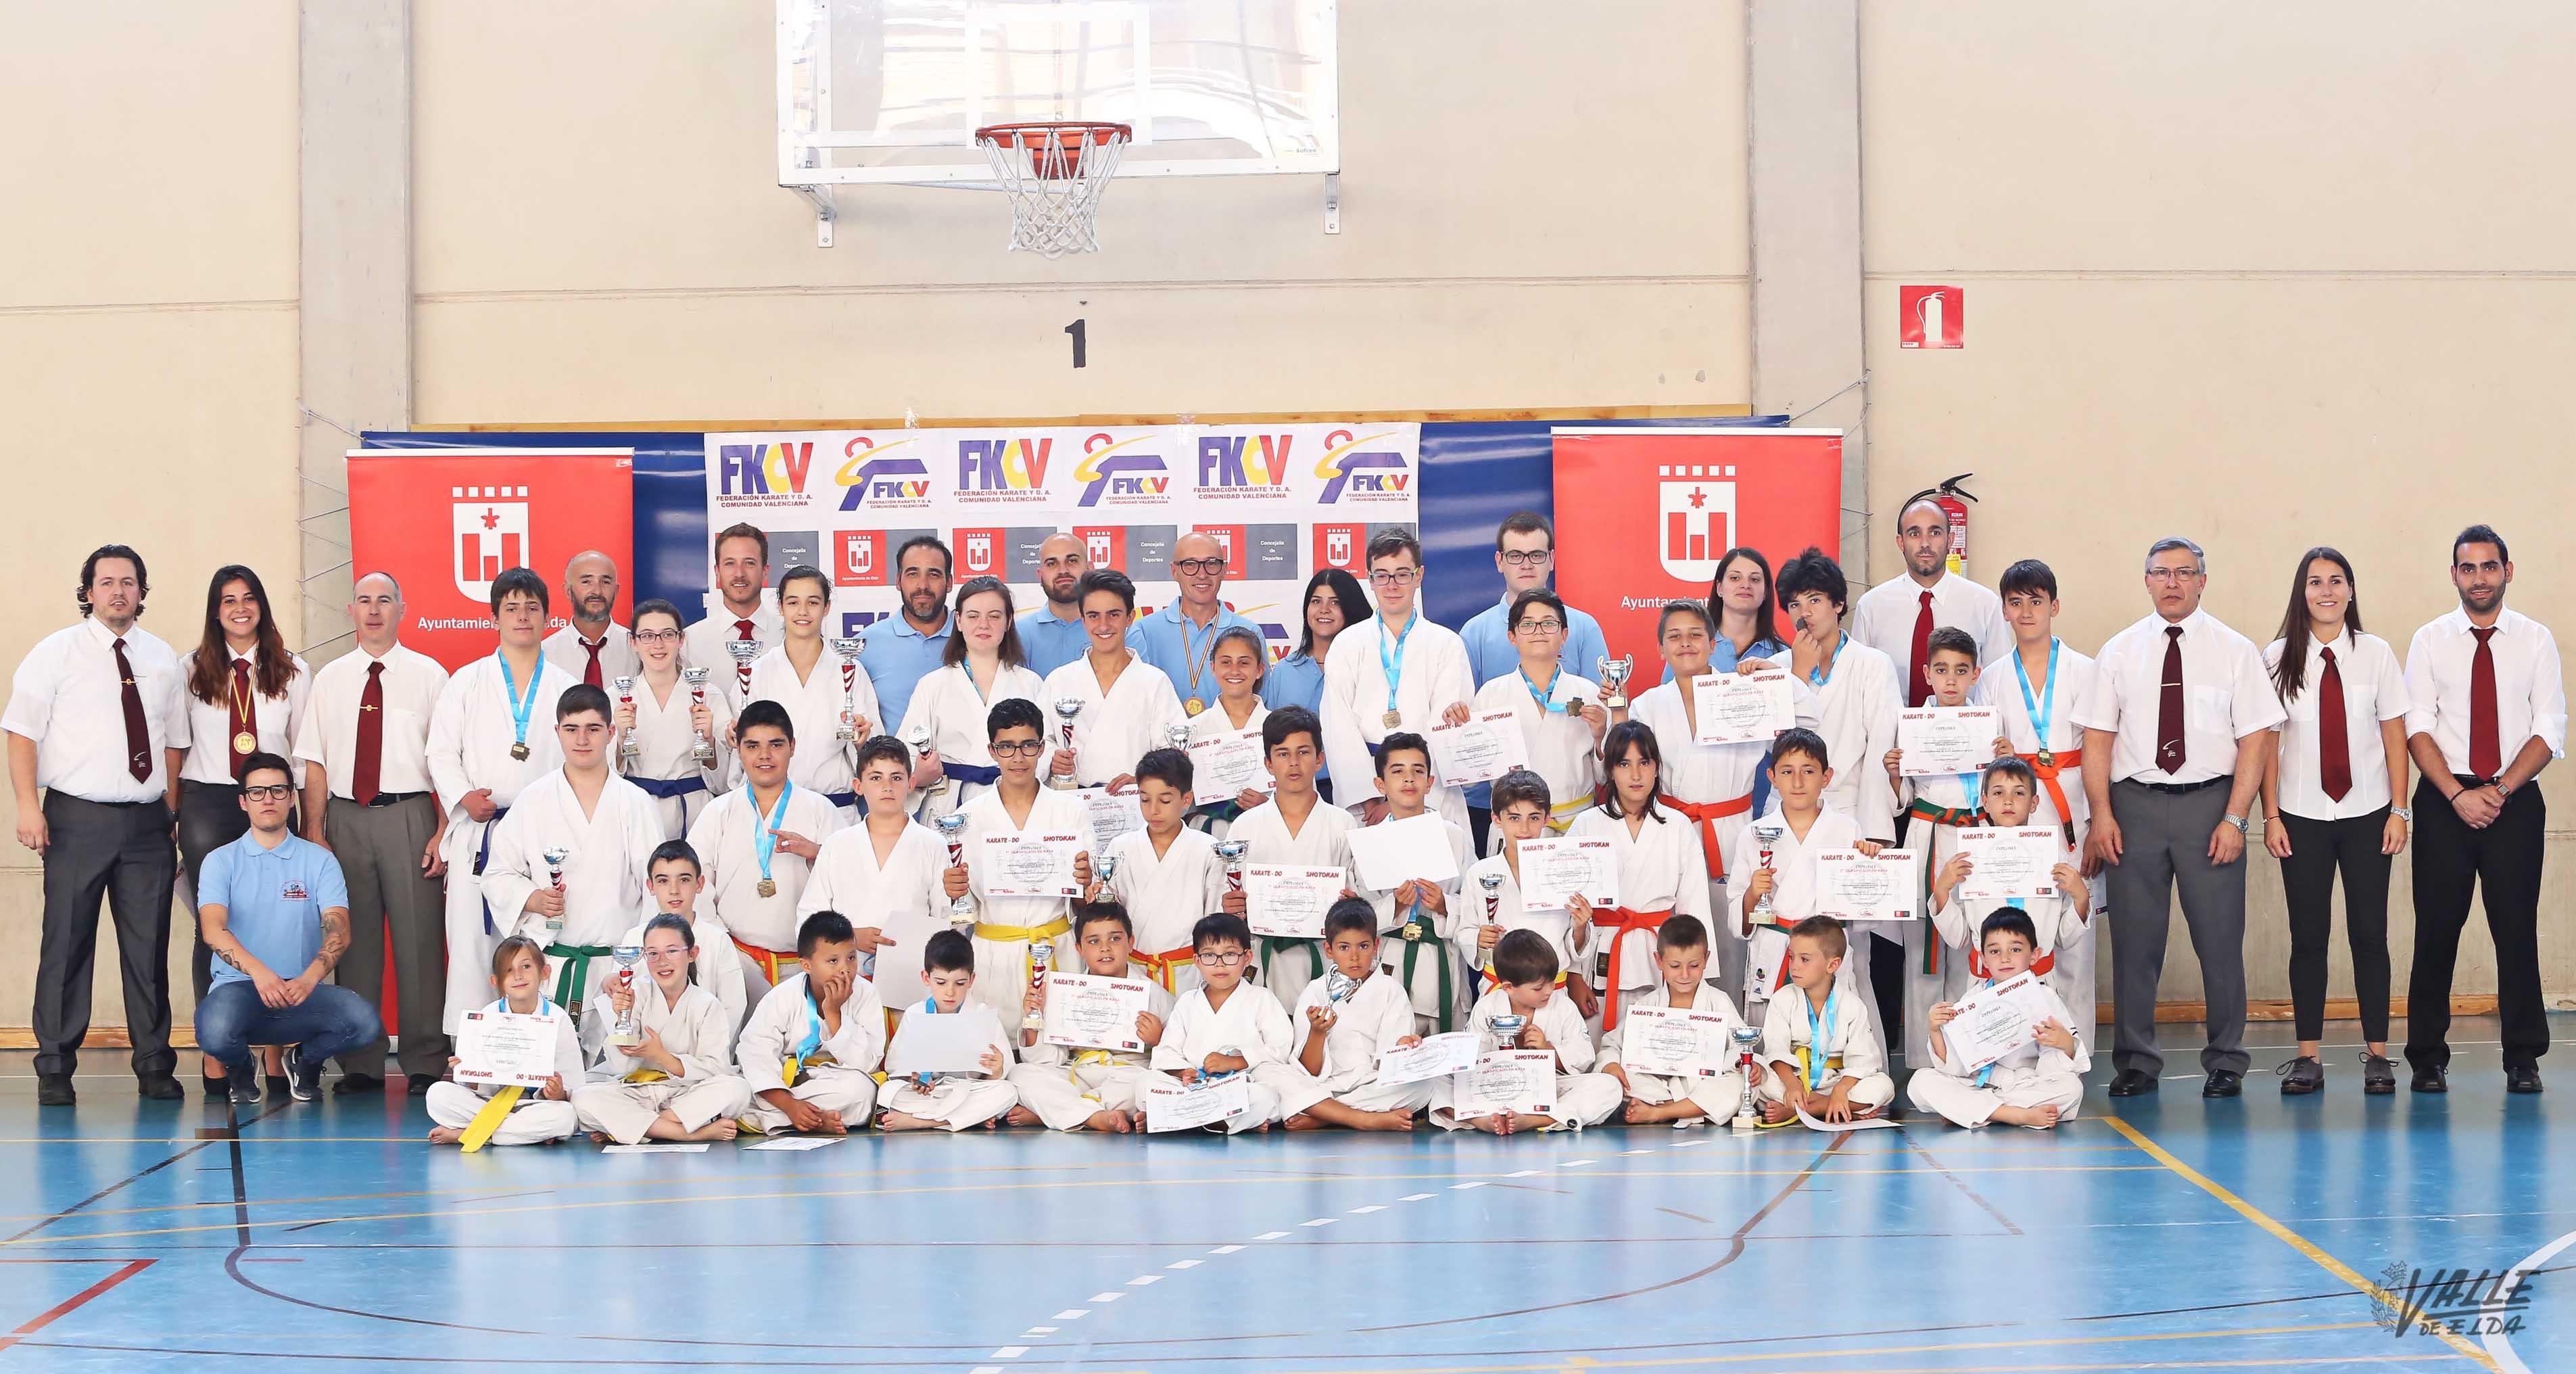 La Escuela Municipal de Karate se pone a prueba